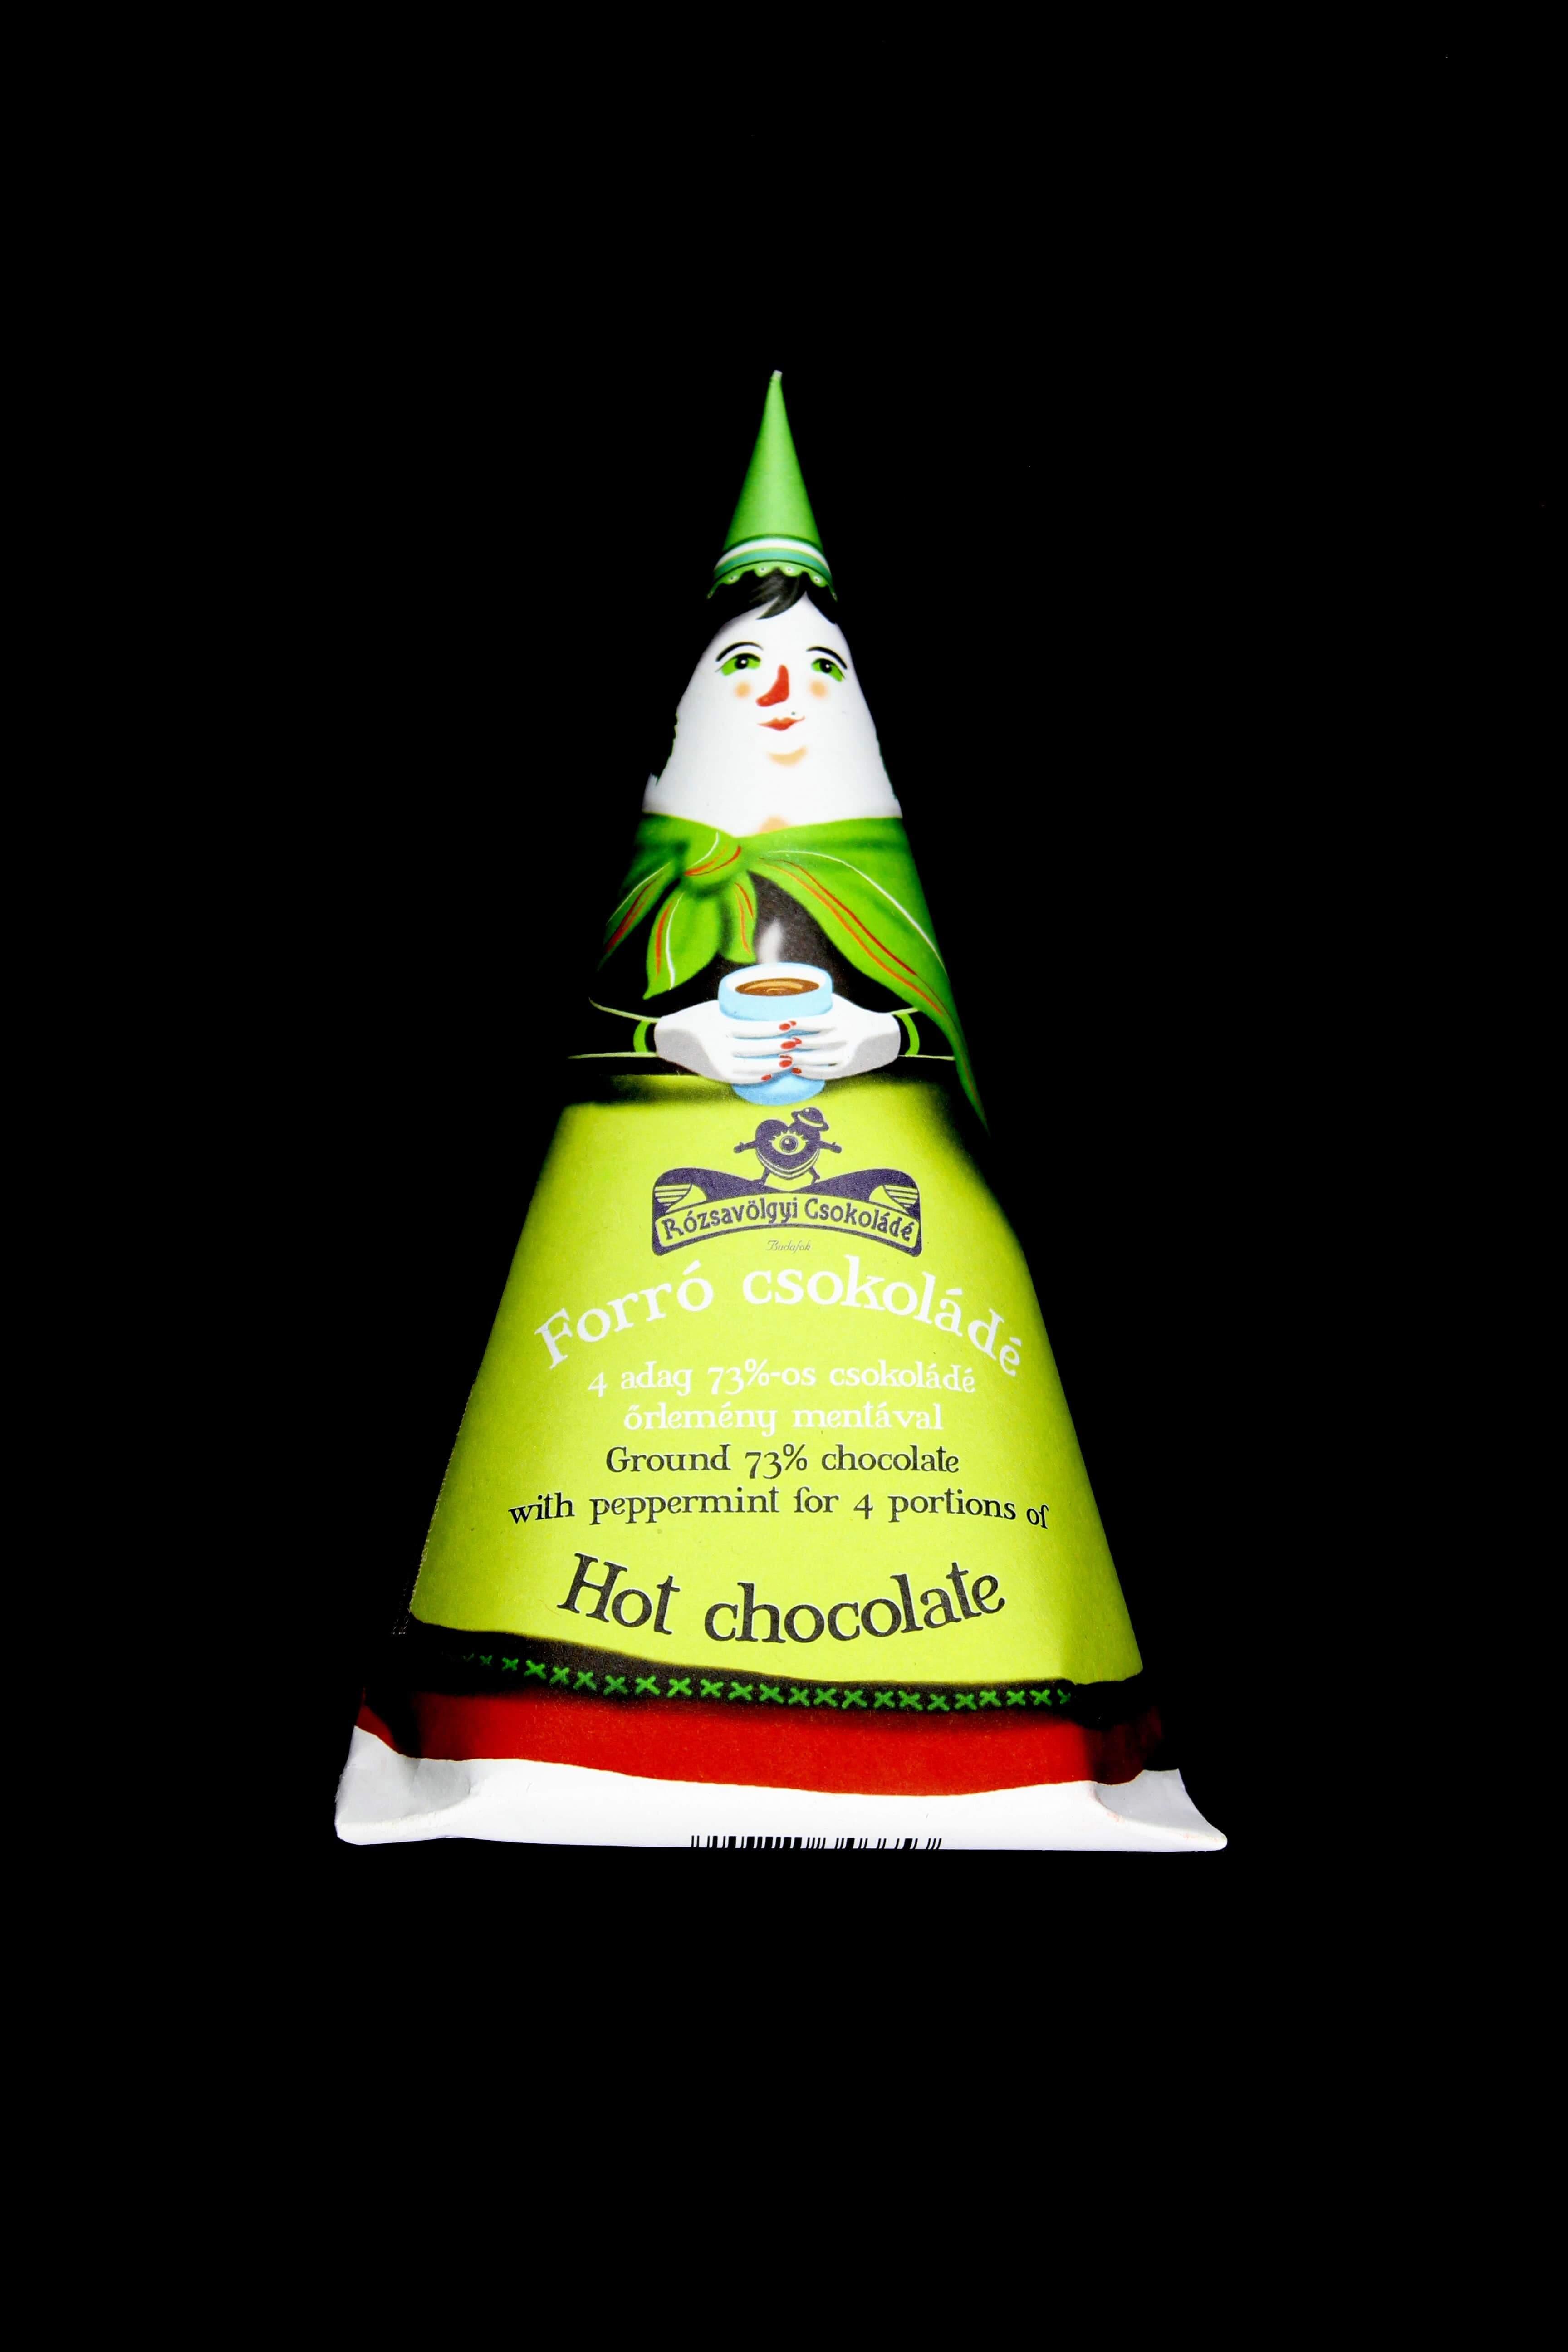 rozsavolgyi csokolade hot chocolate peppermint 73